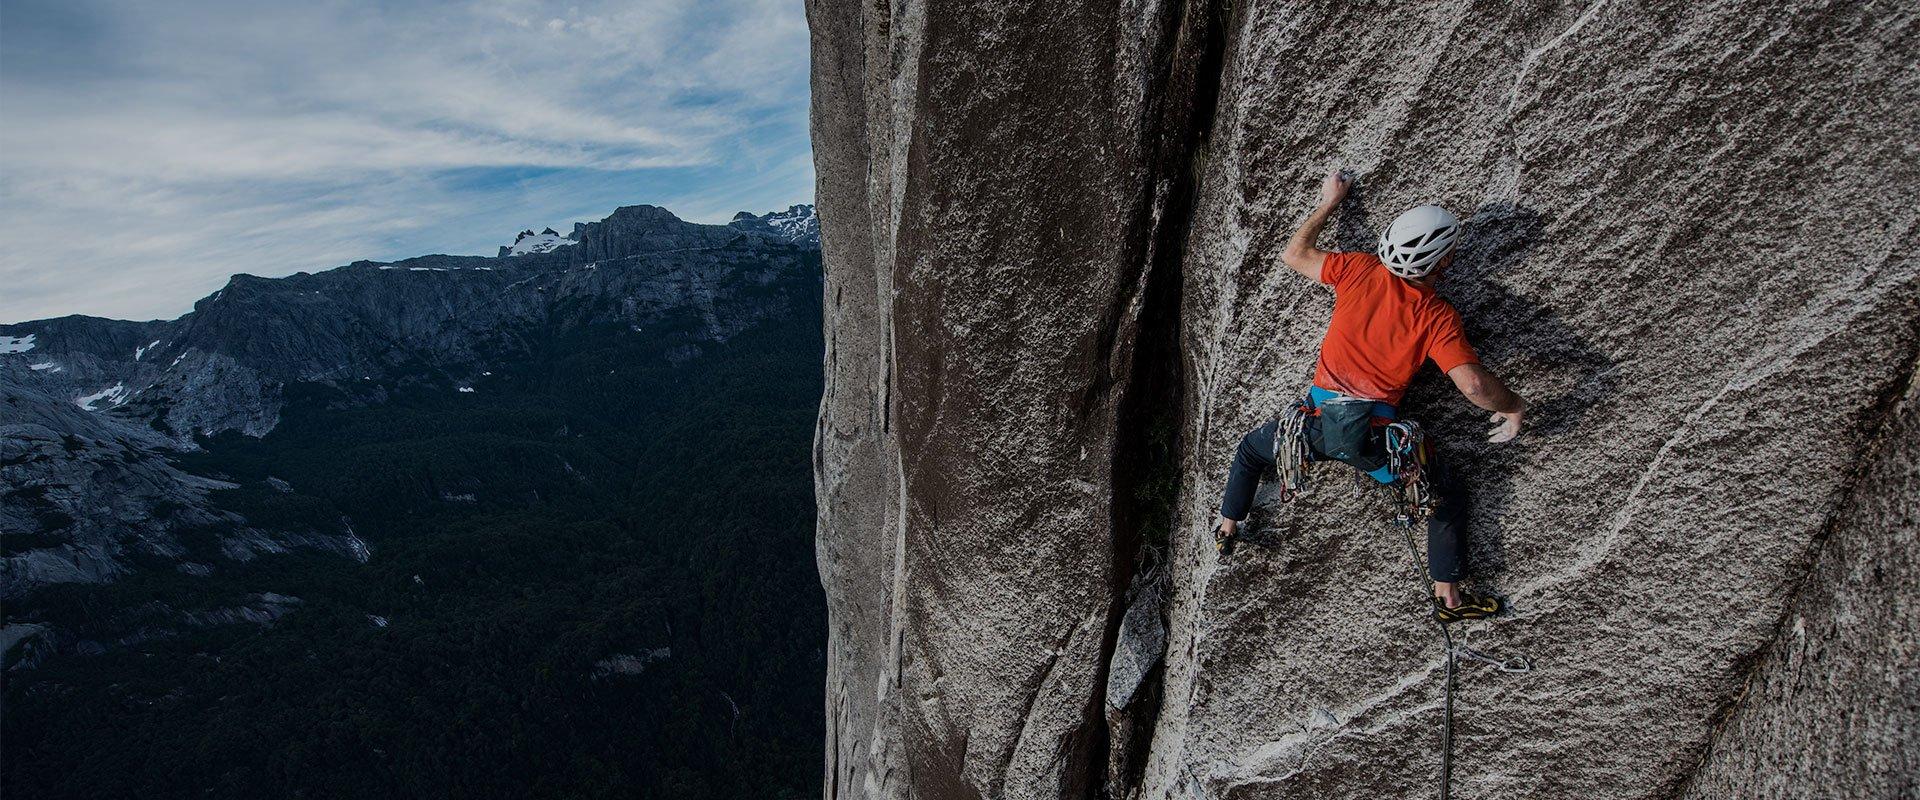 vimff best of climbing drew smith title bg